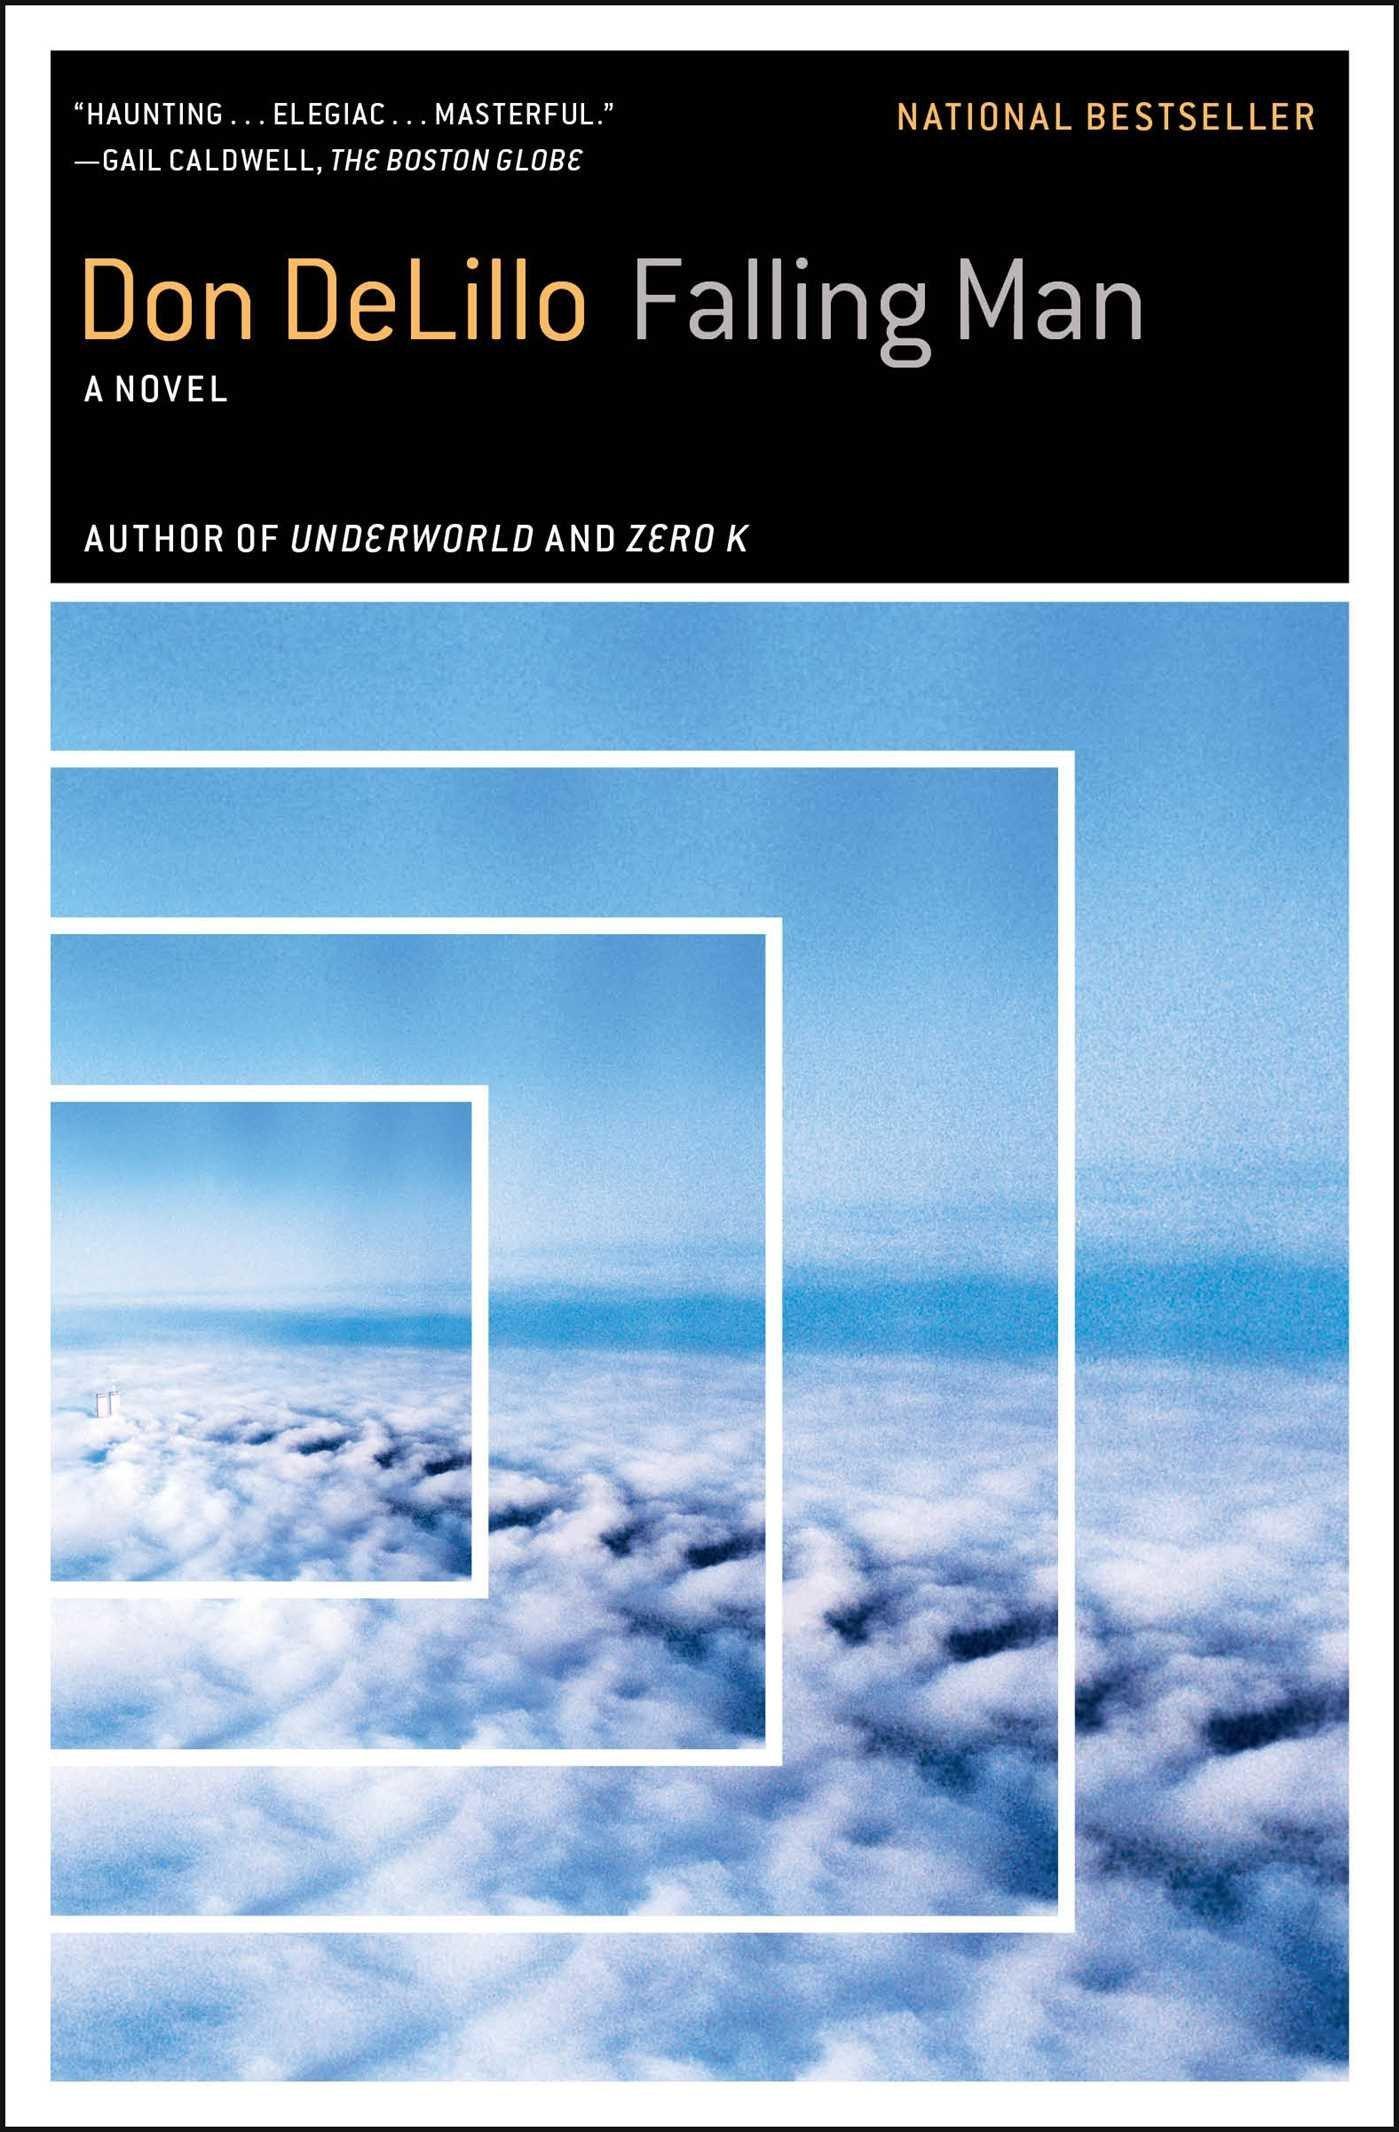 Amazon.com: Falling Man: A Novel (9781416546061): Don DeLillo: Books